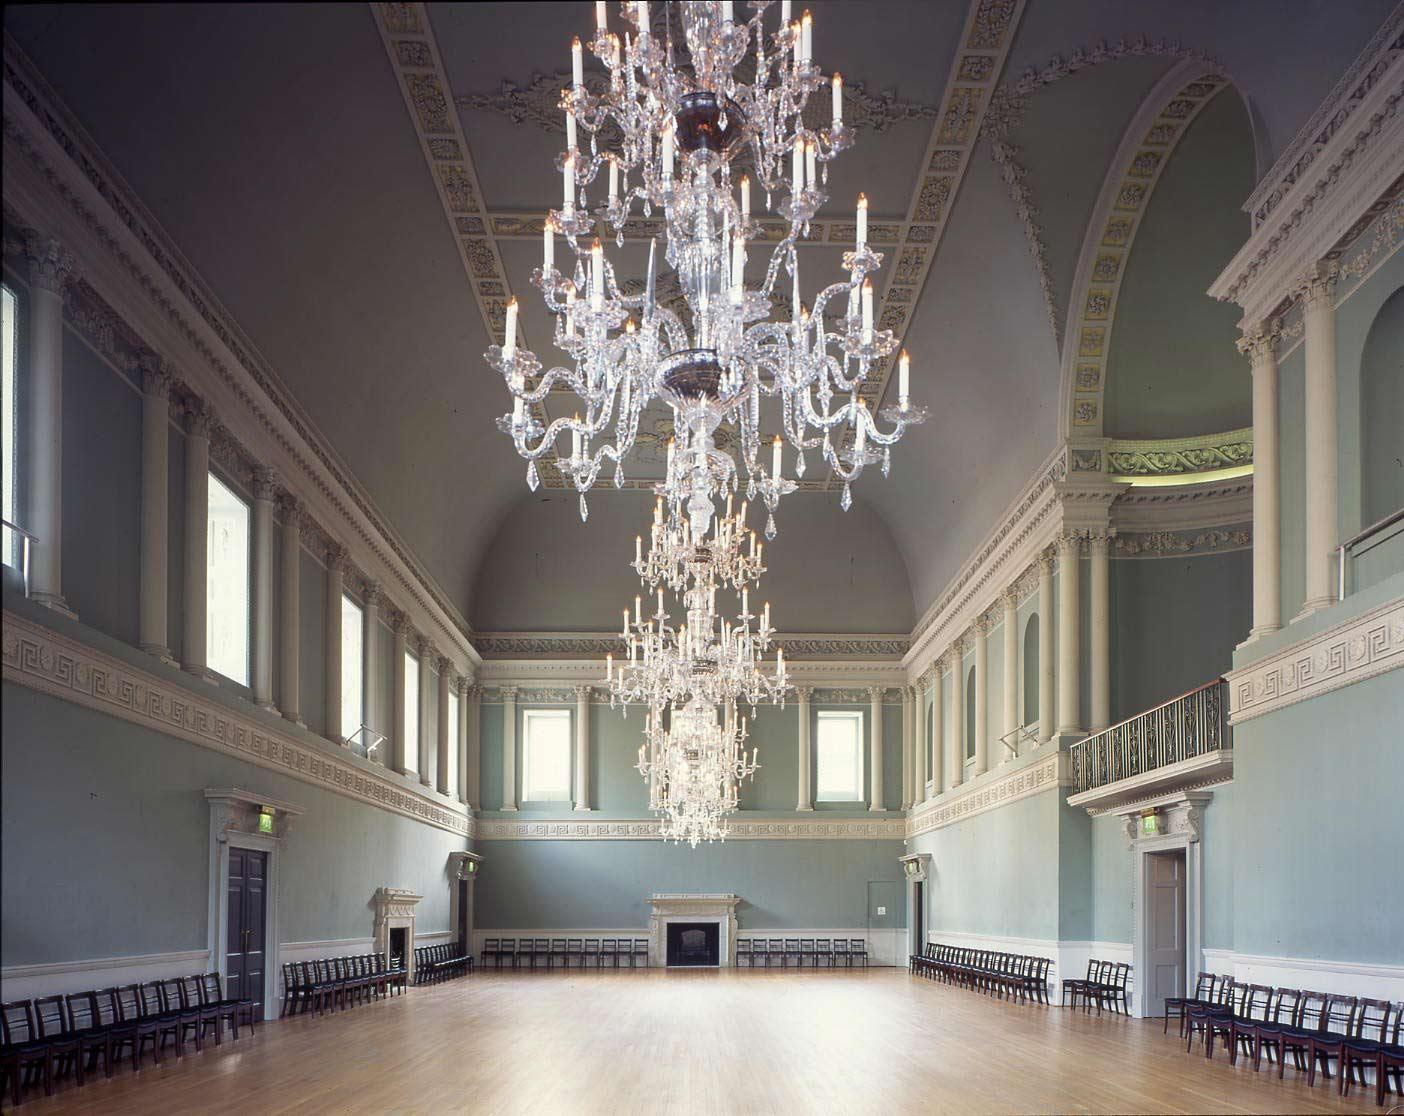 Assembly Rooms Ballroom